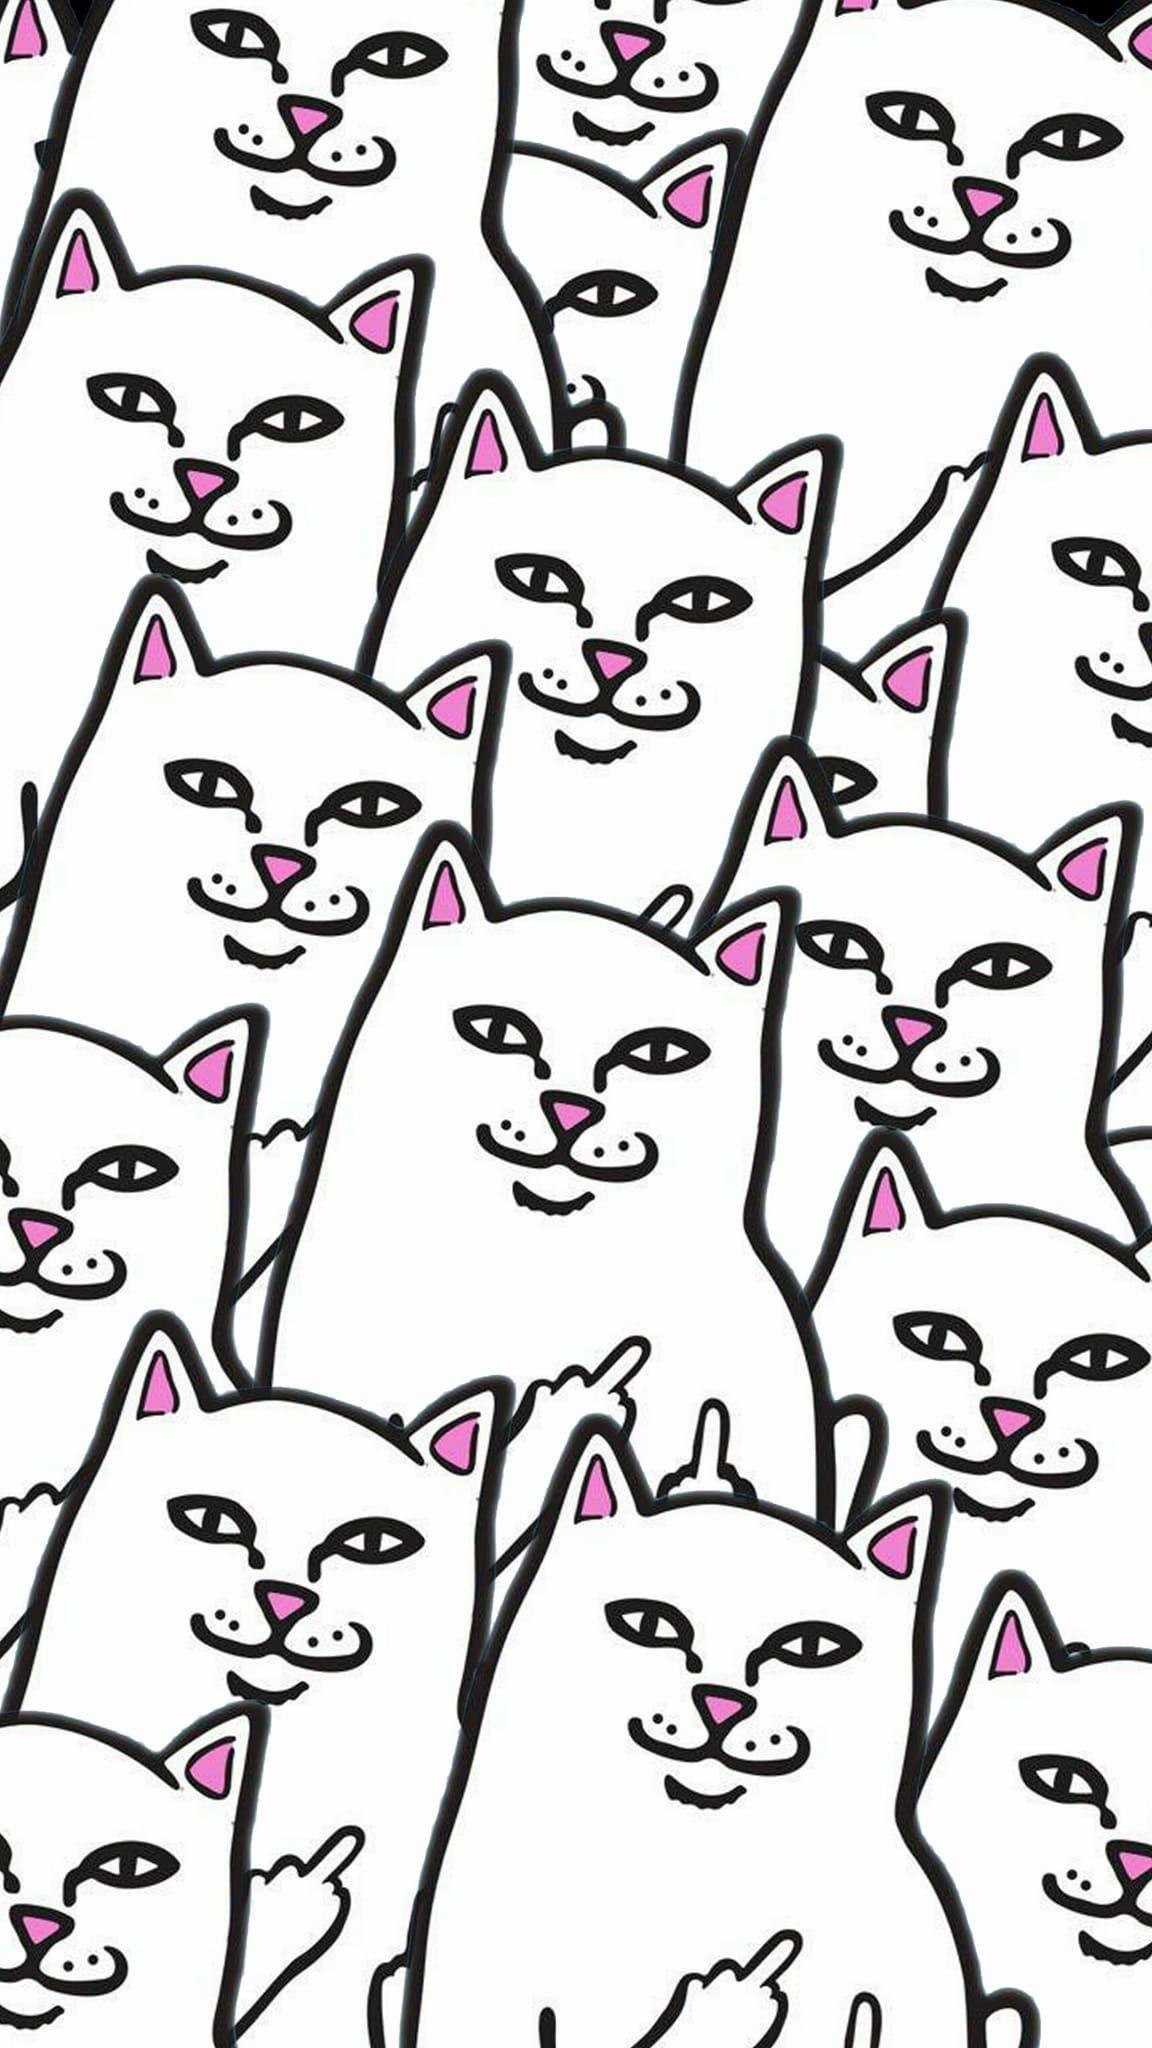 Collage RipnDip Cat phone wallpaper